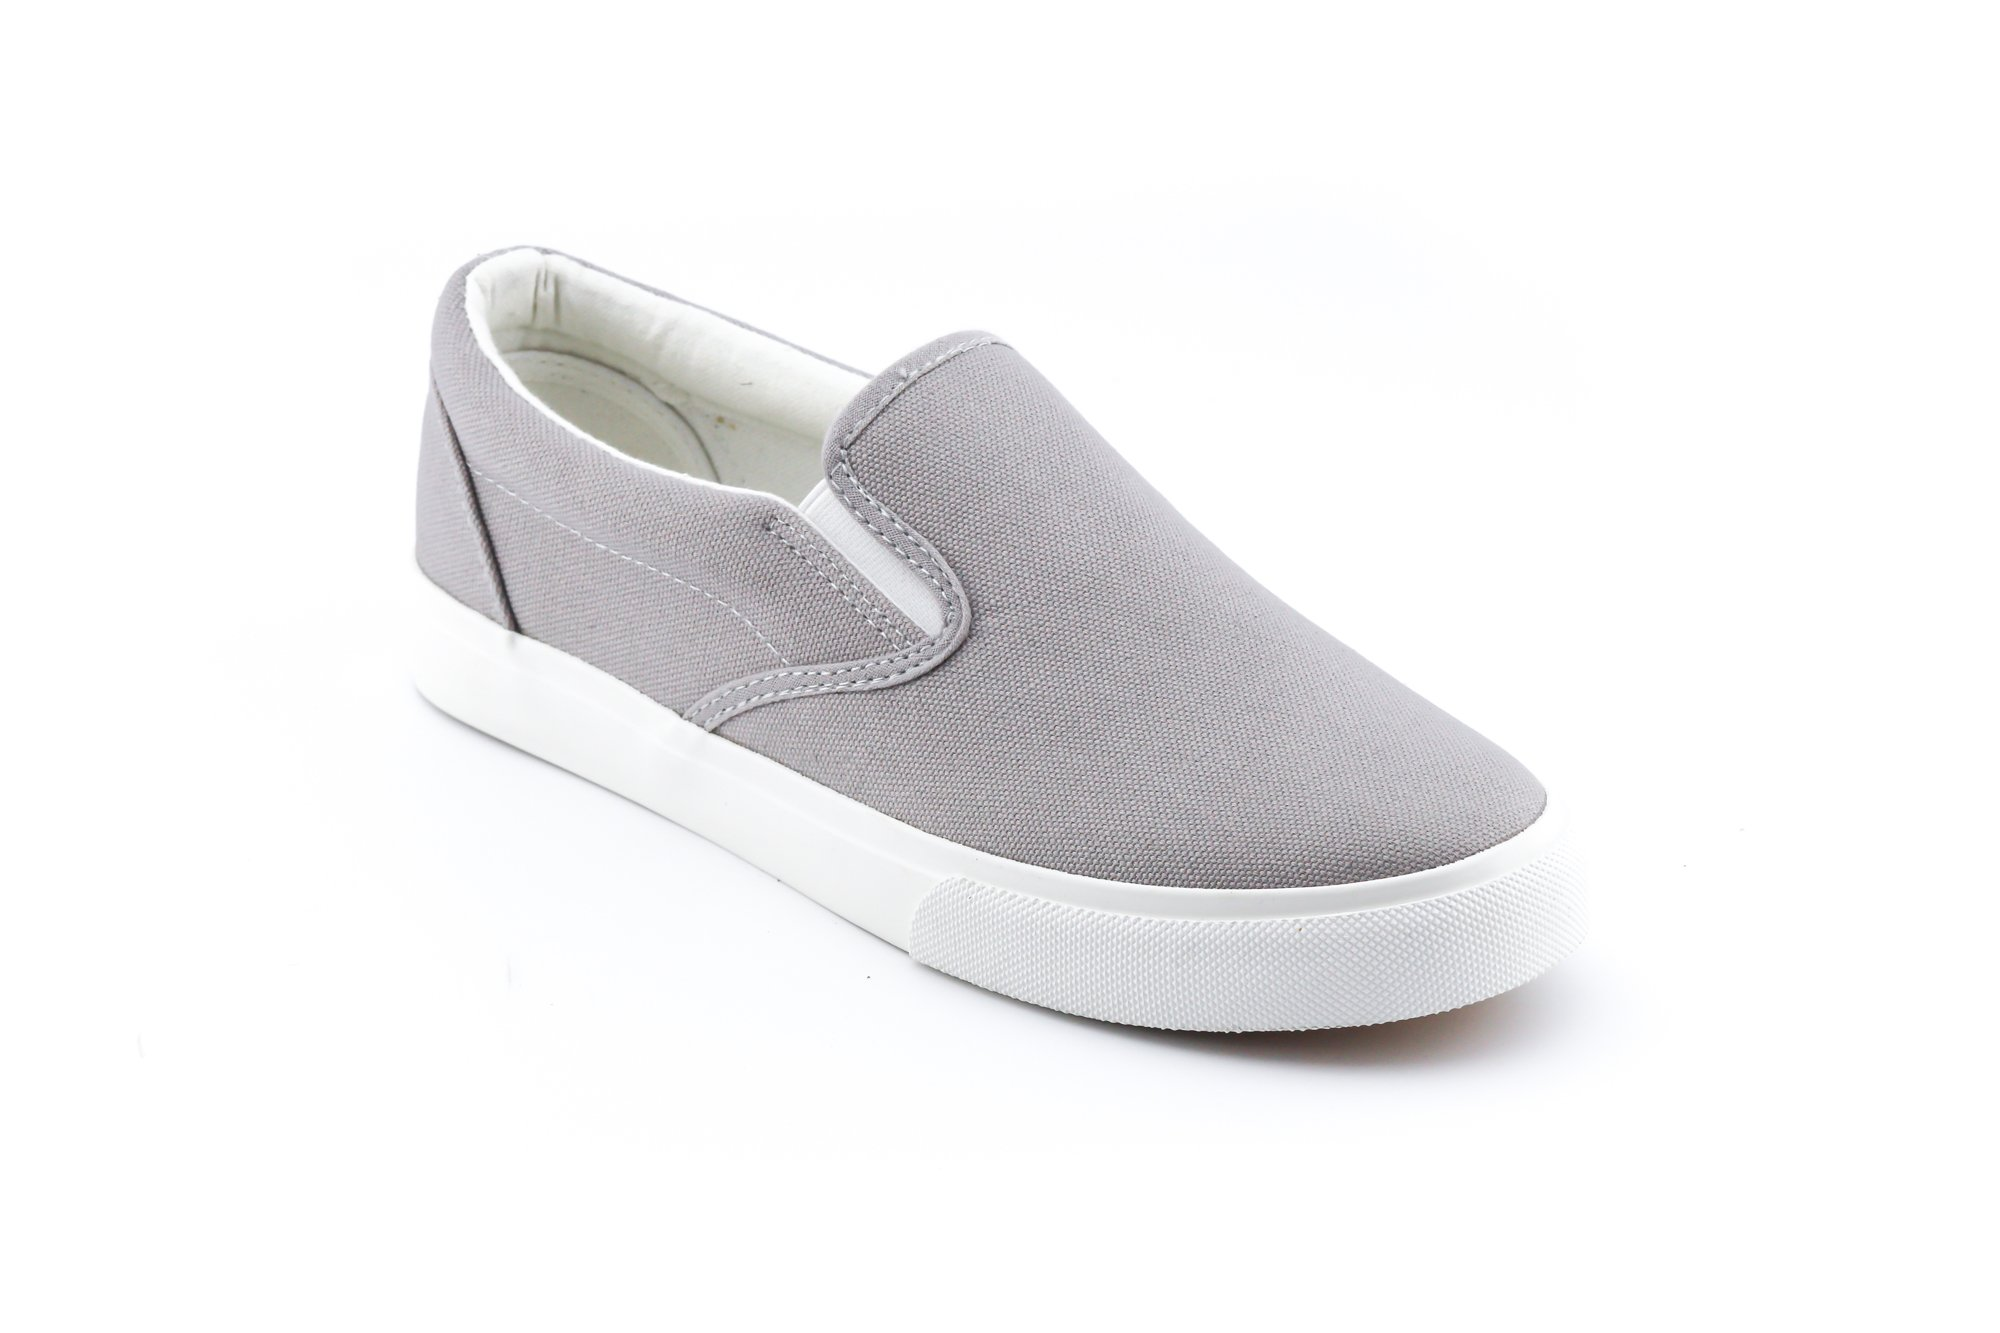 CALICO KIKI HALLIE-CK01 Women's Slip On Canvas Sneakers Casual Comfort (8 US Grey)